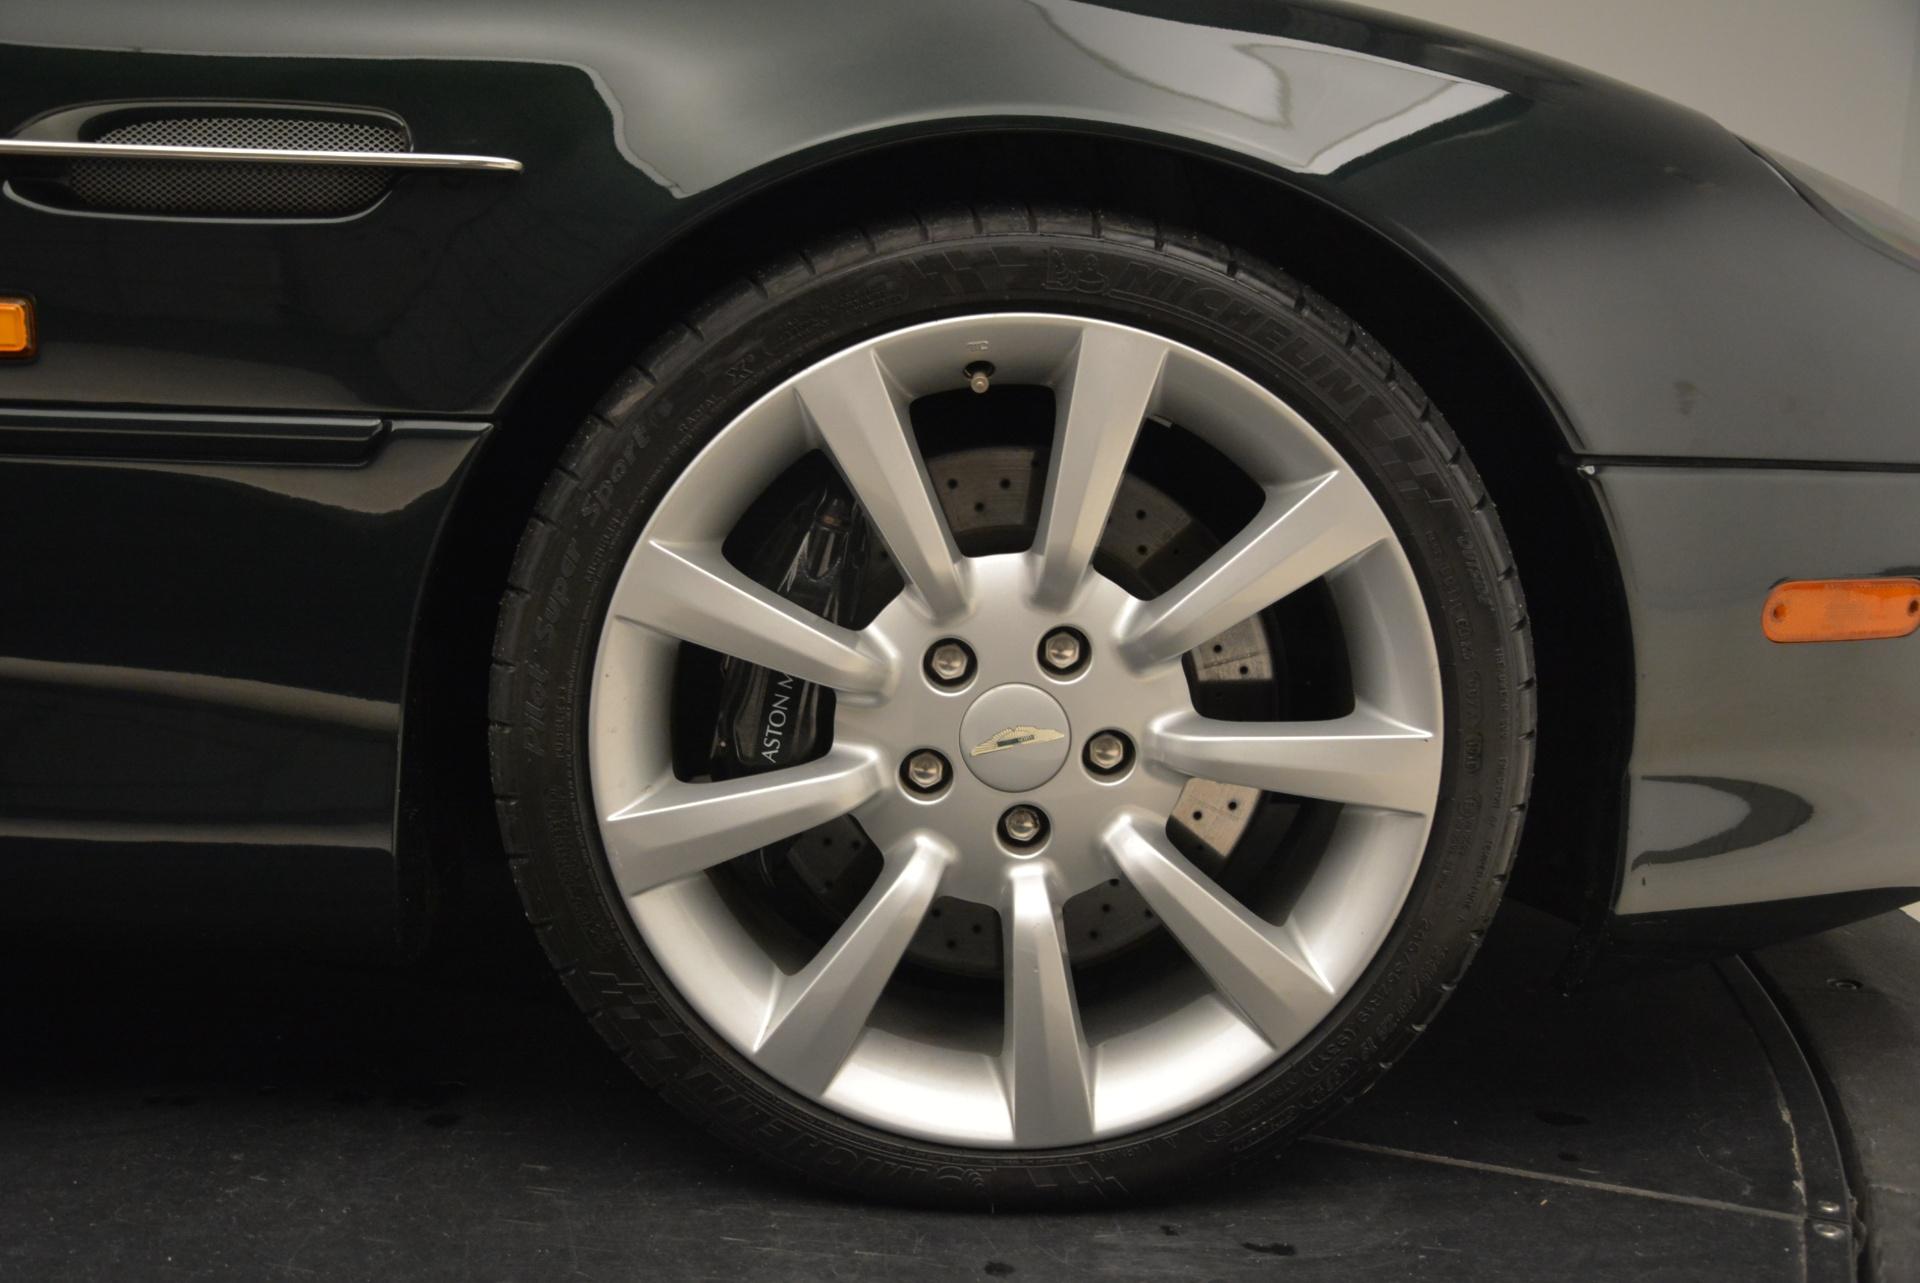 Used 2003 Aston Martin DB7 Vantage Volante For Sale In Westport, CT 2084_p32